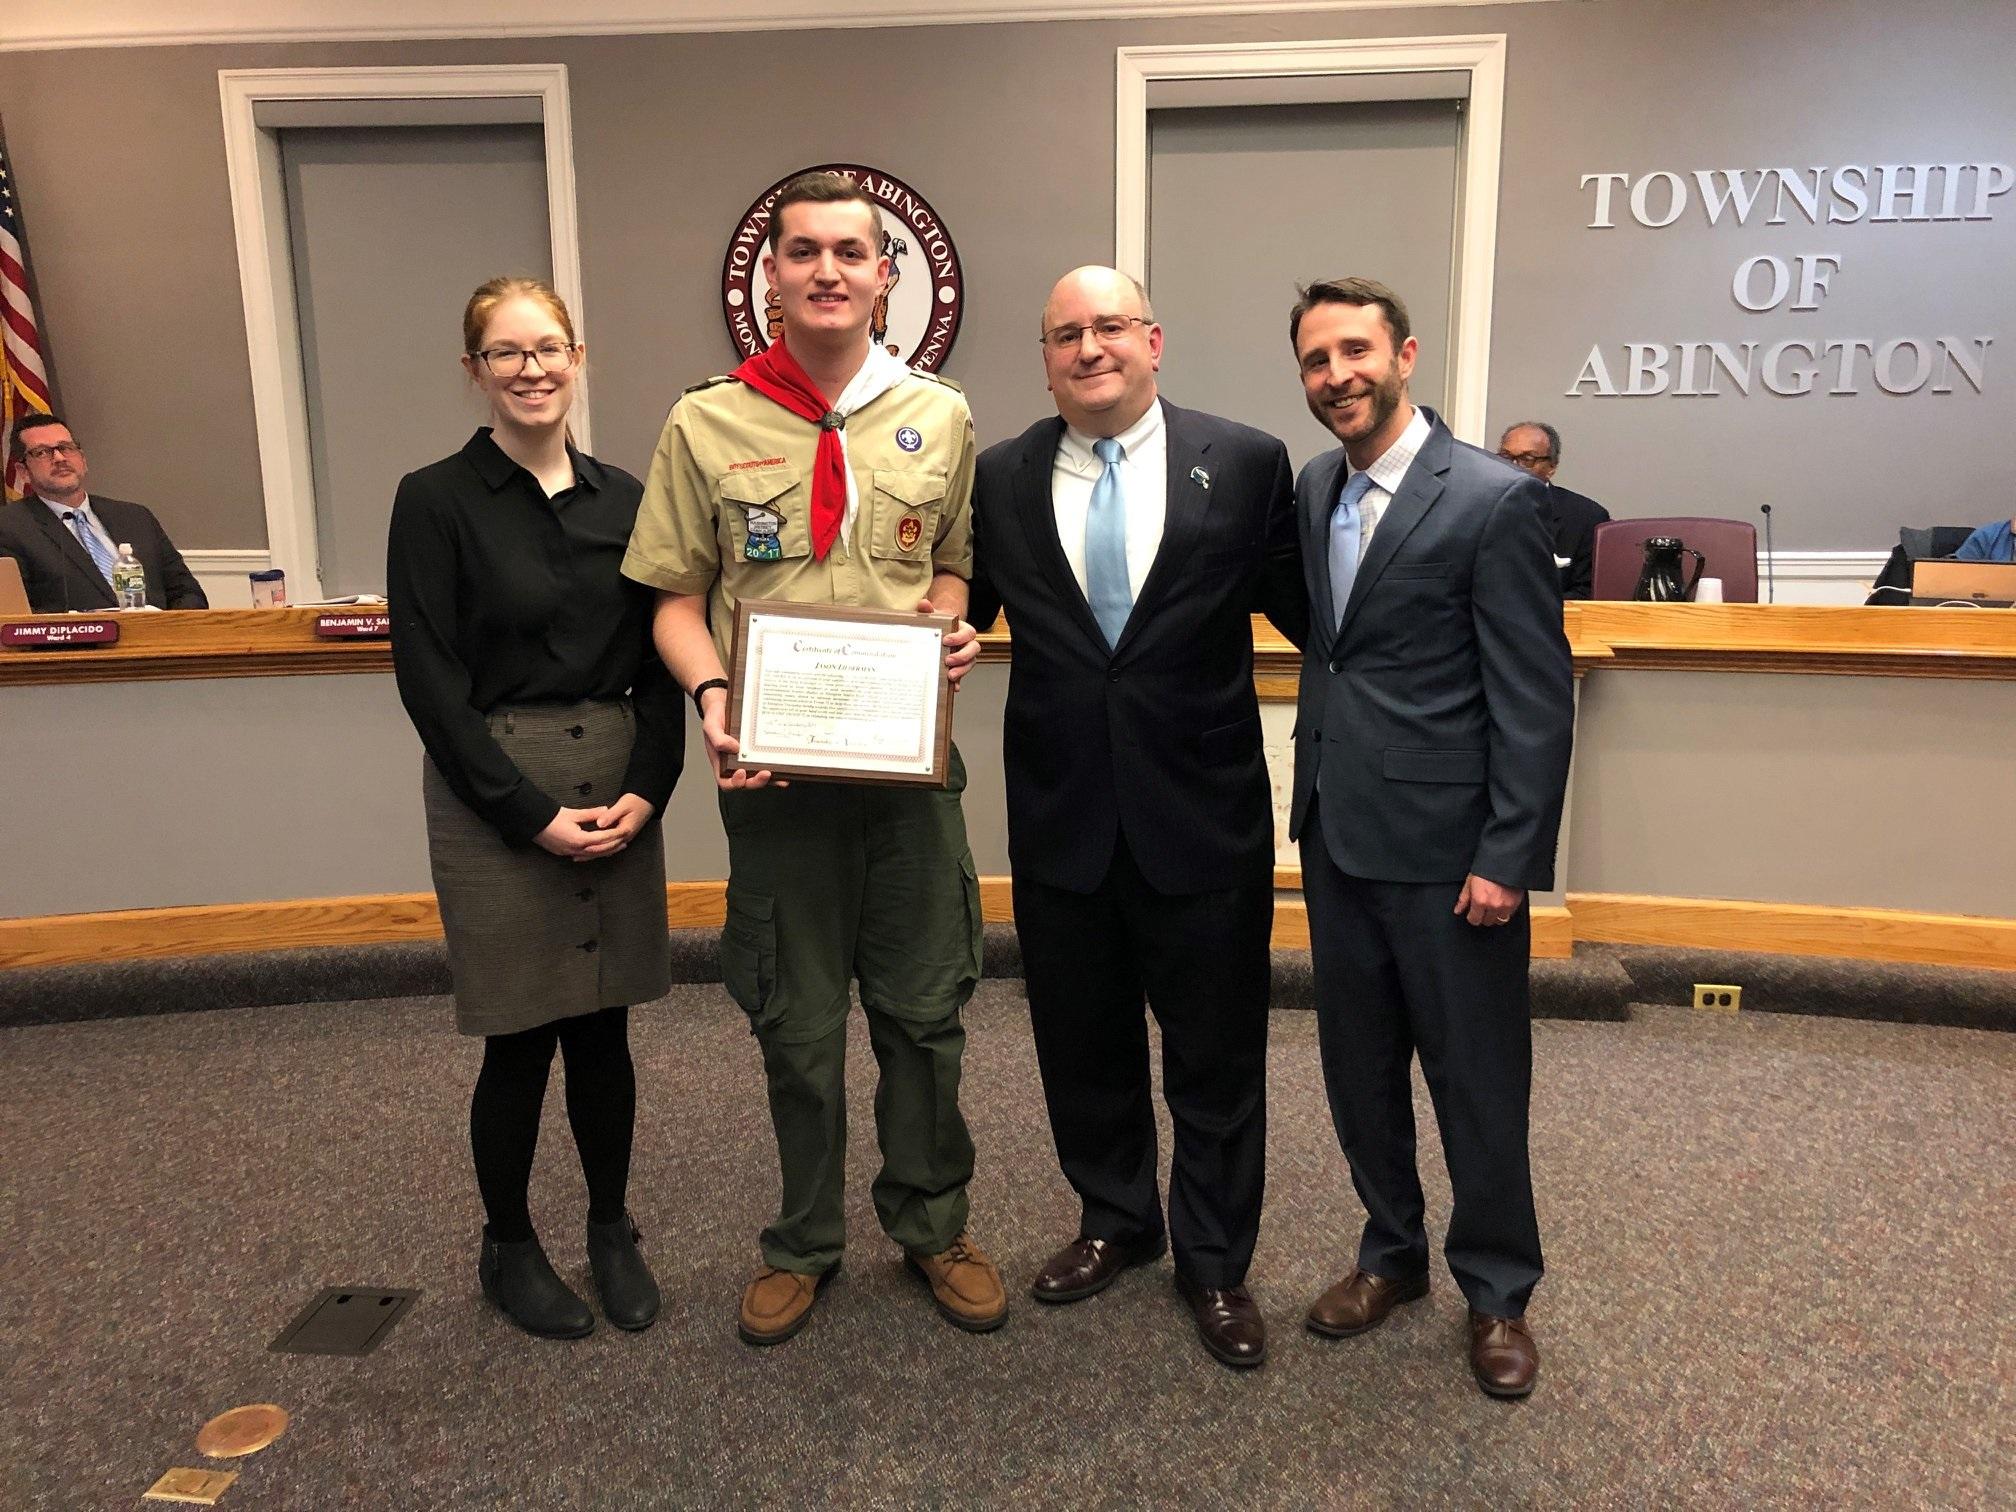 Eagle Scout - Abington Township.jpg